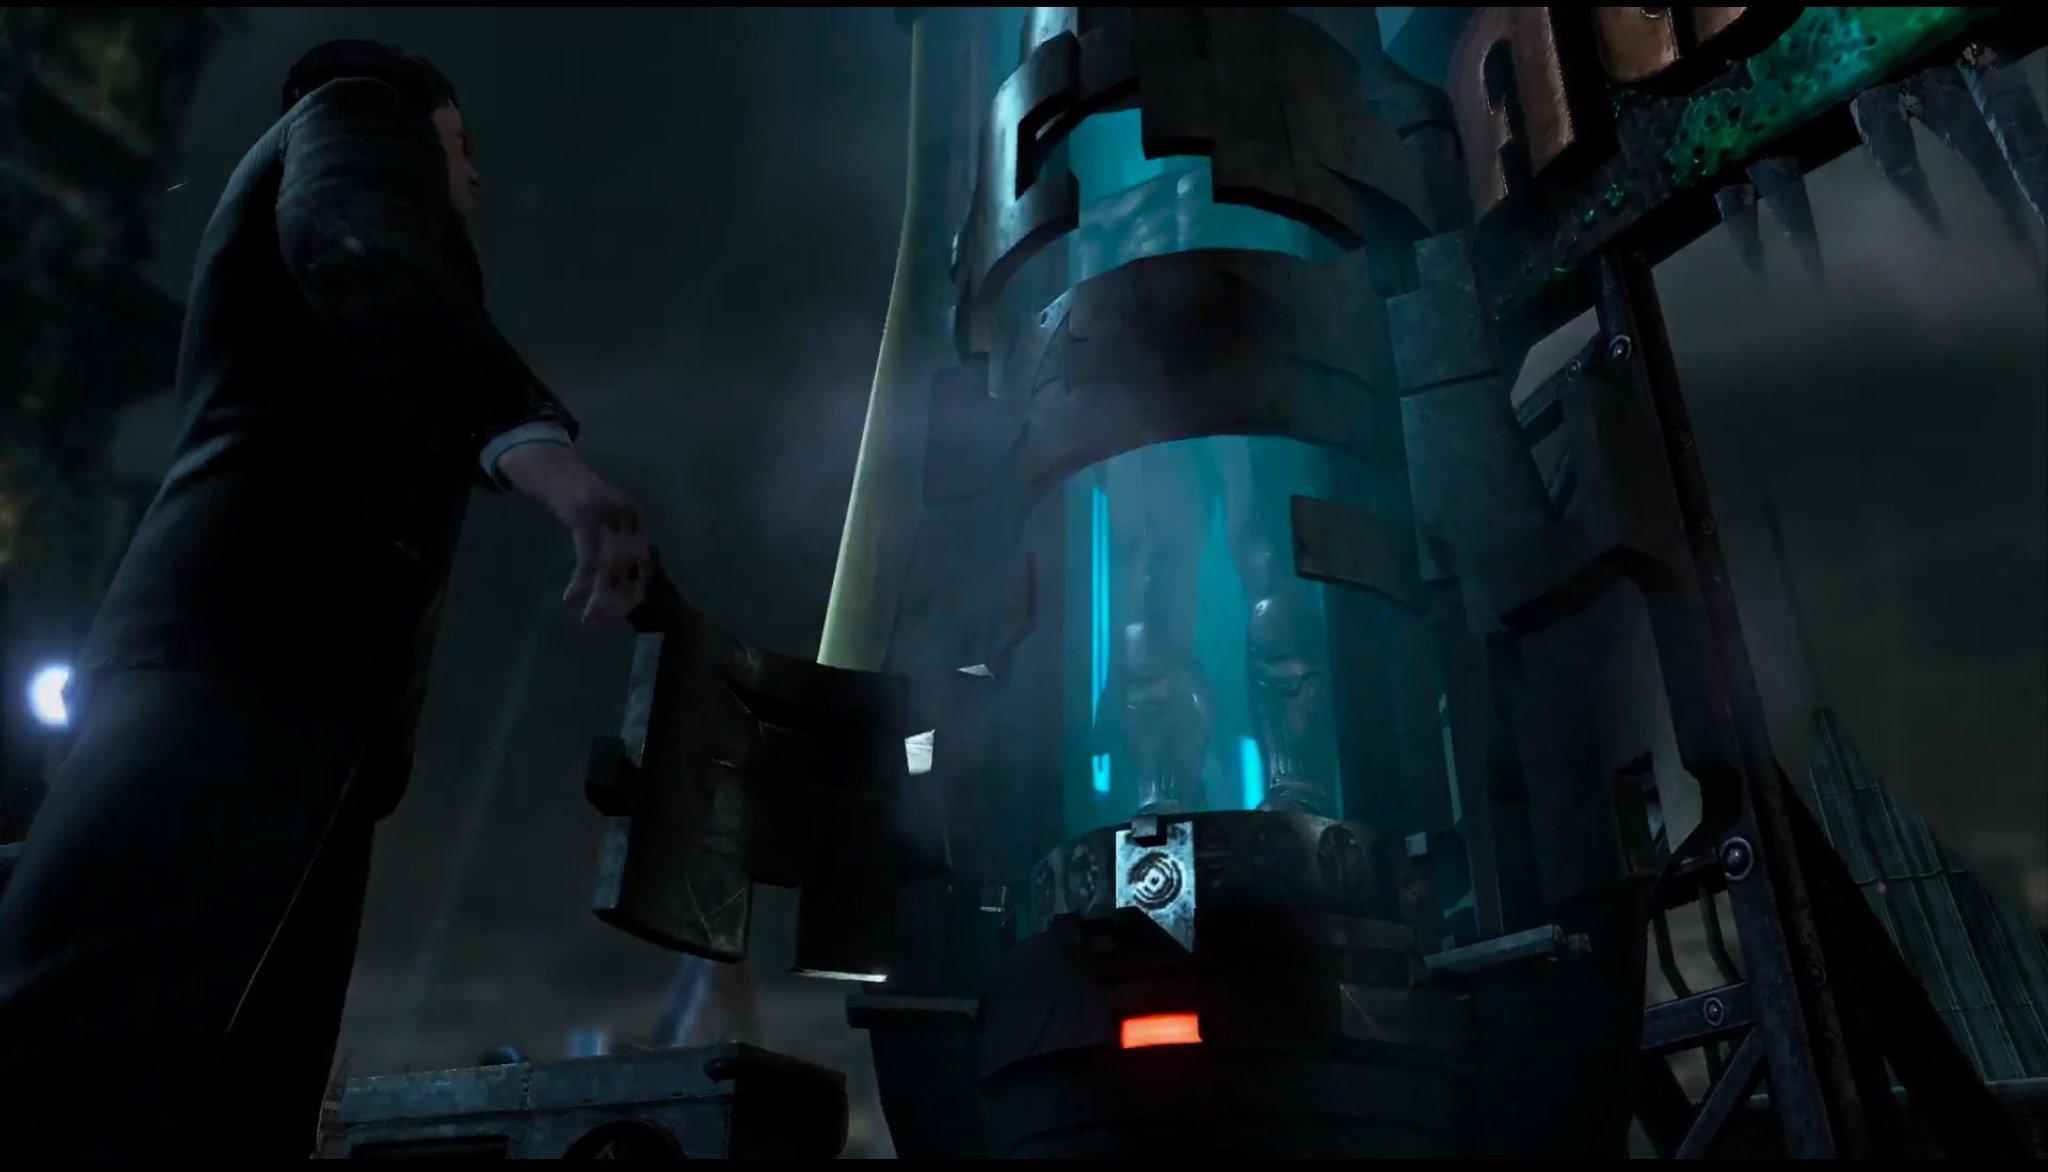 batman return  arkham ps  ps comparison screens shows ue capability stunning graphics